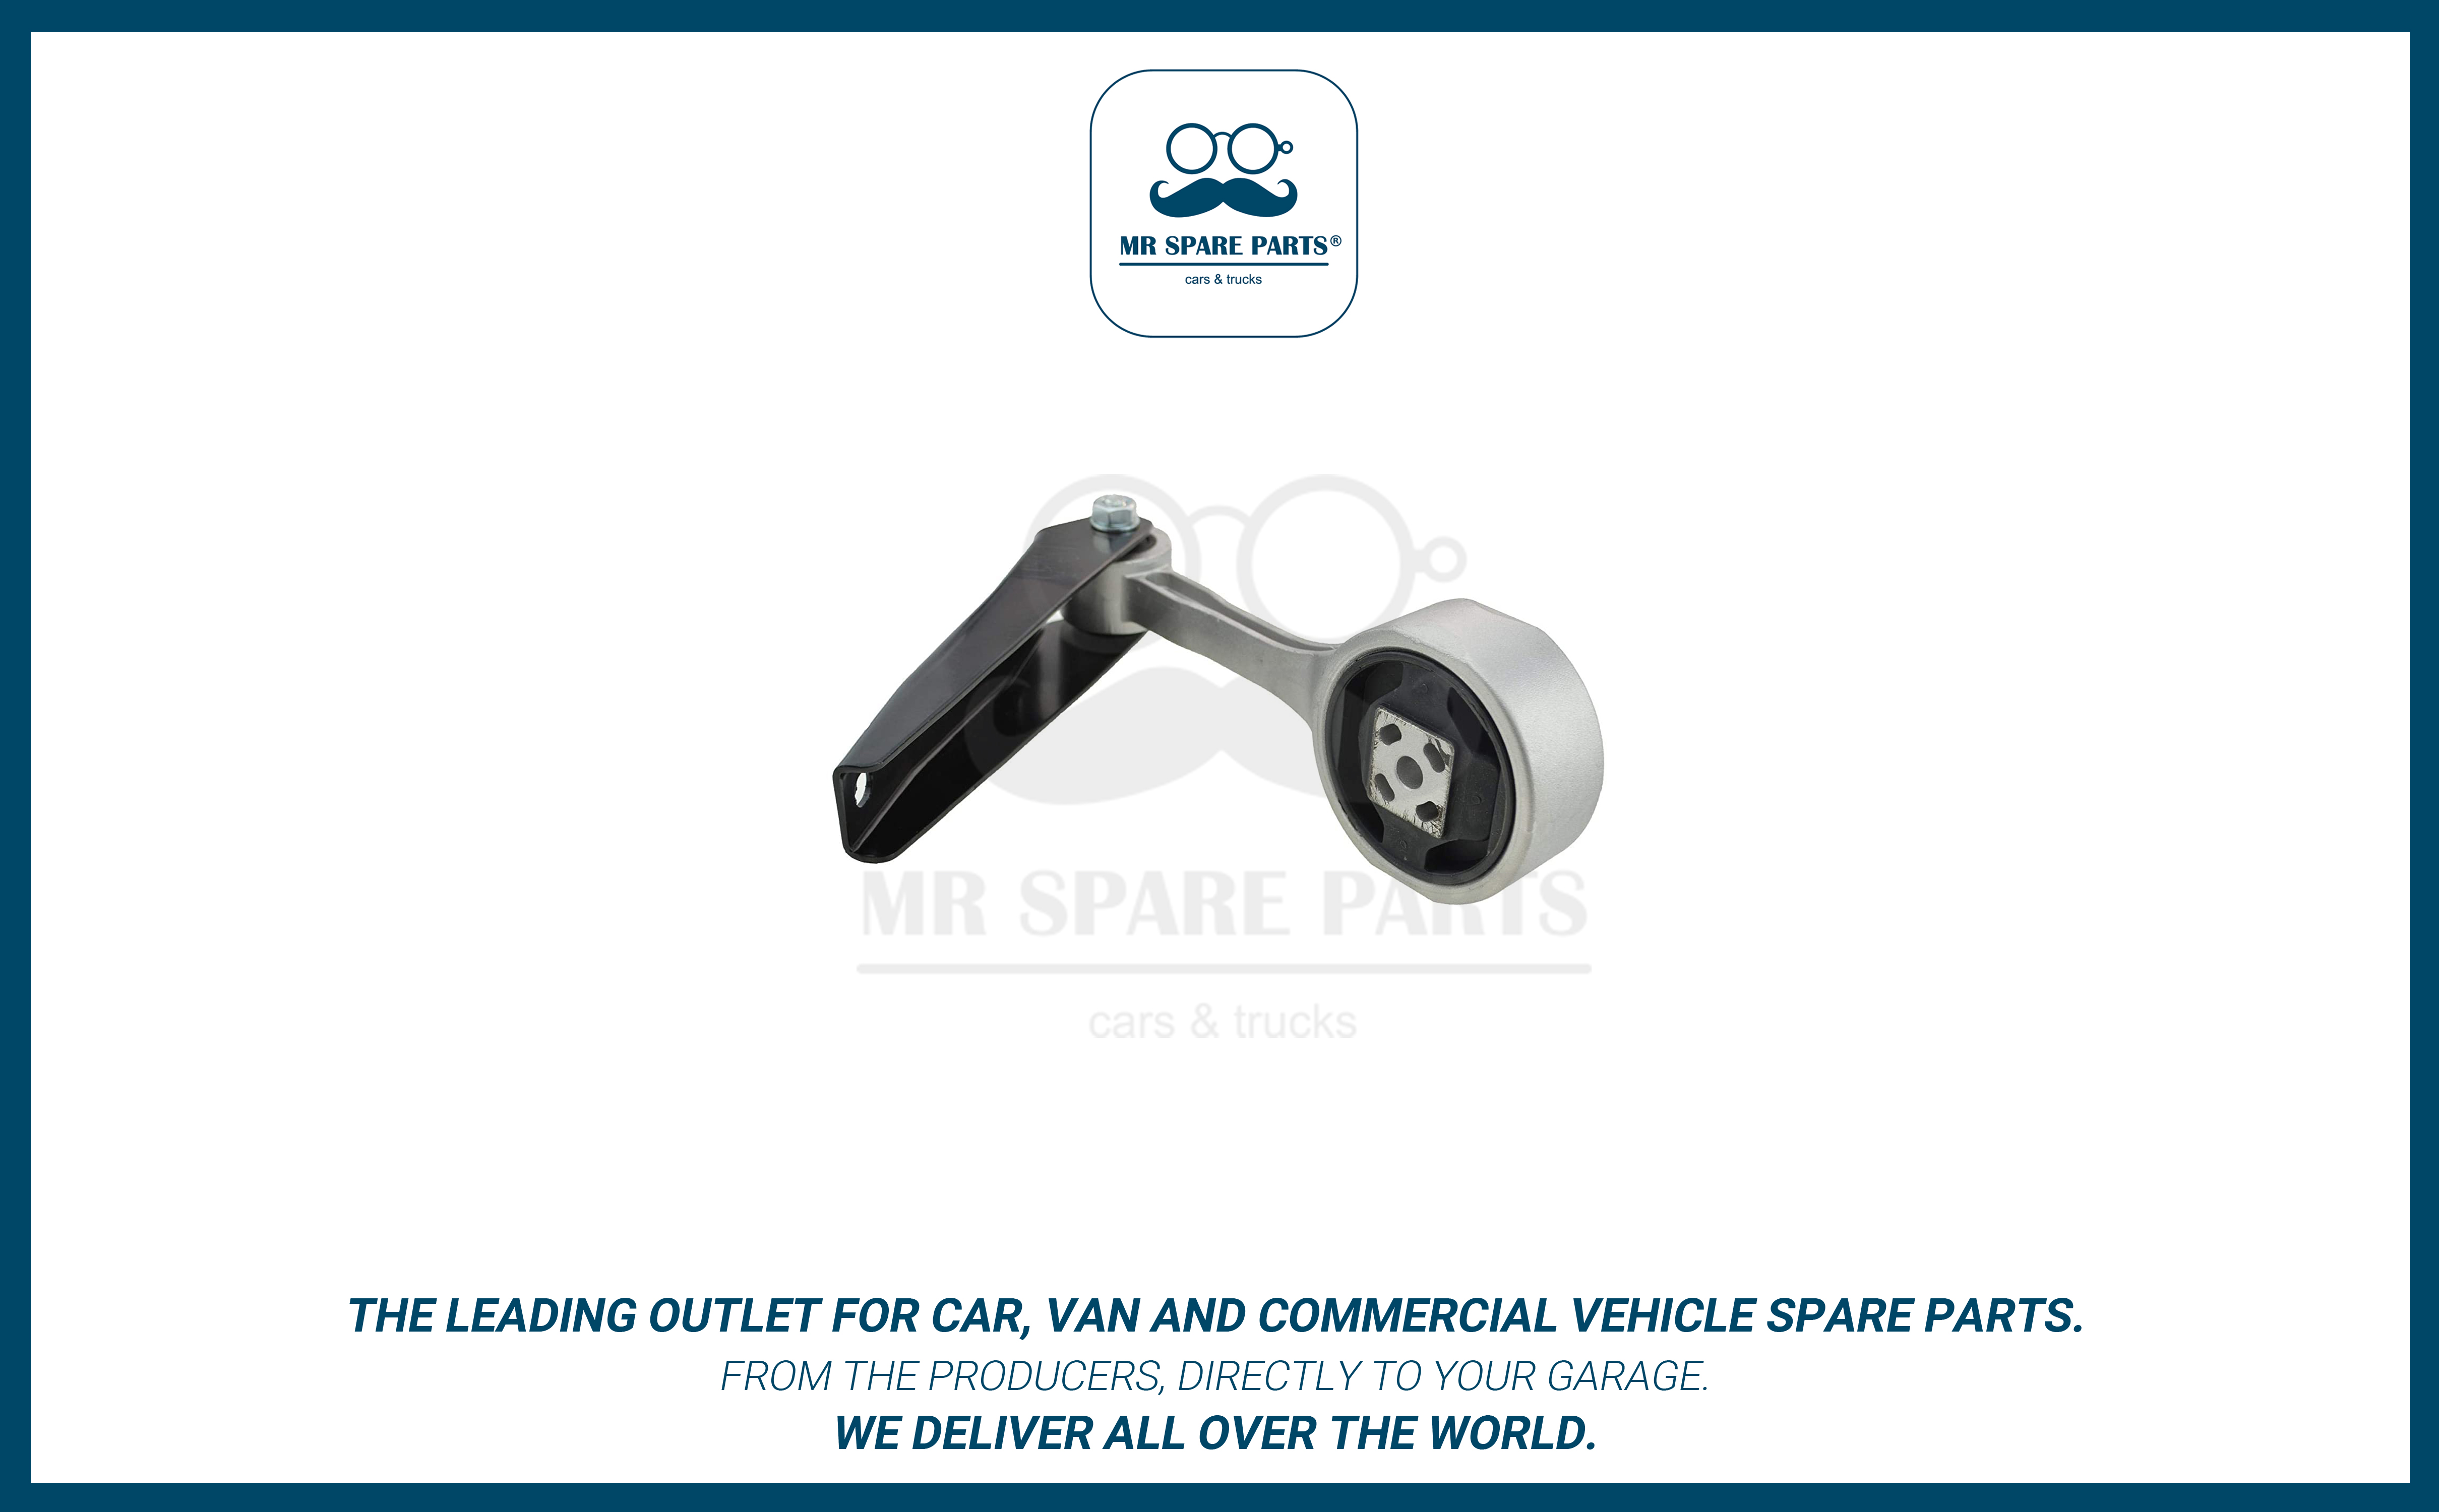 REAR GEARBOX TRANSMISSION MOUNTING FOR VW POLO SEAT SKODA 1.4 16V 6Q0199851AL